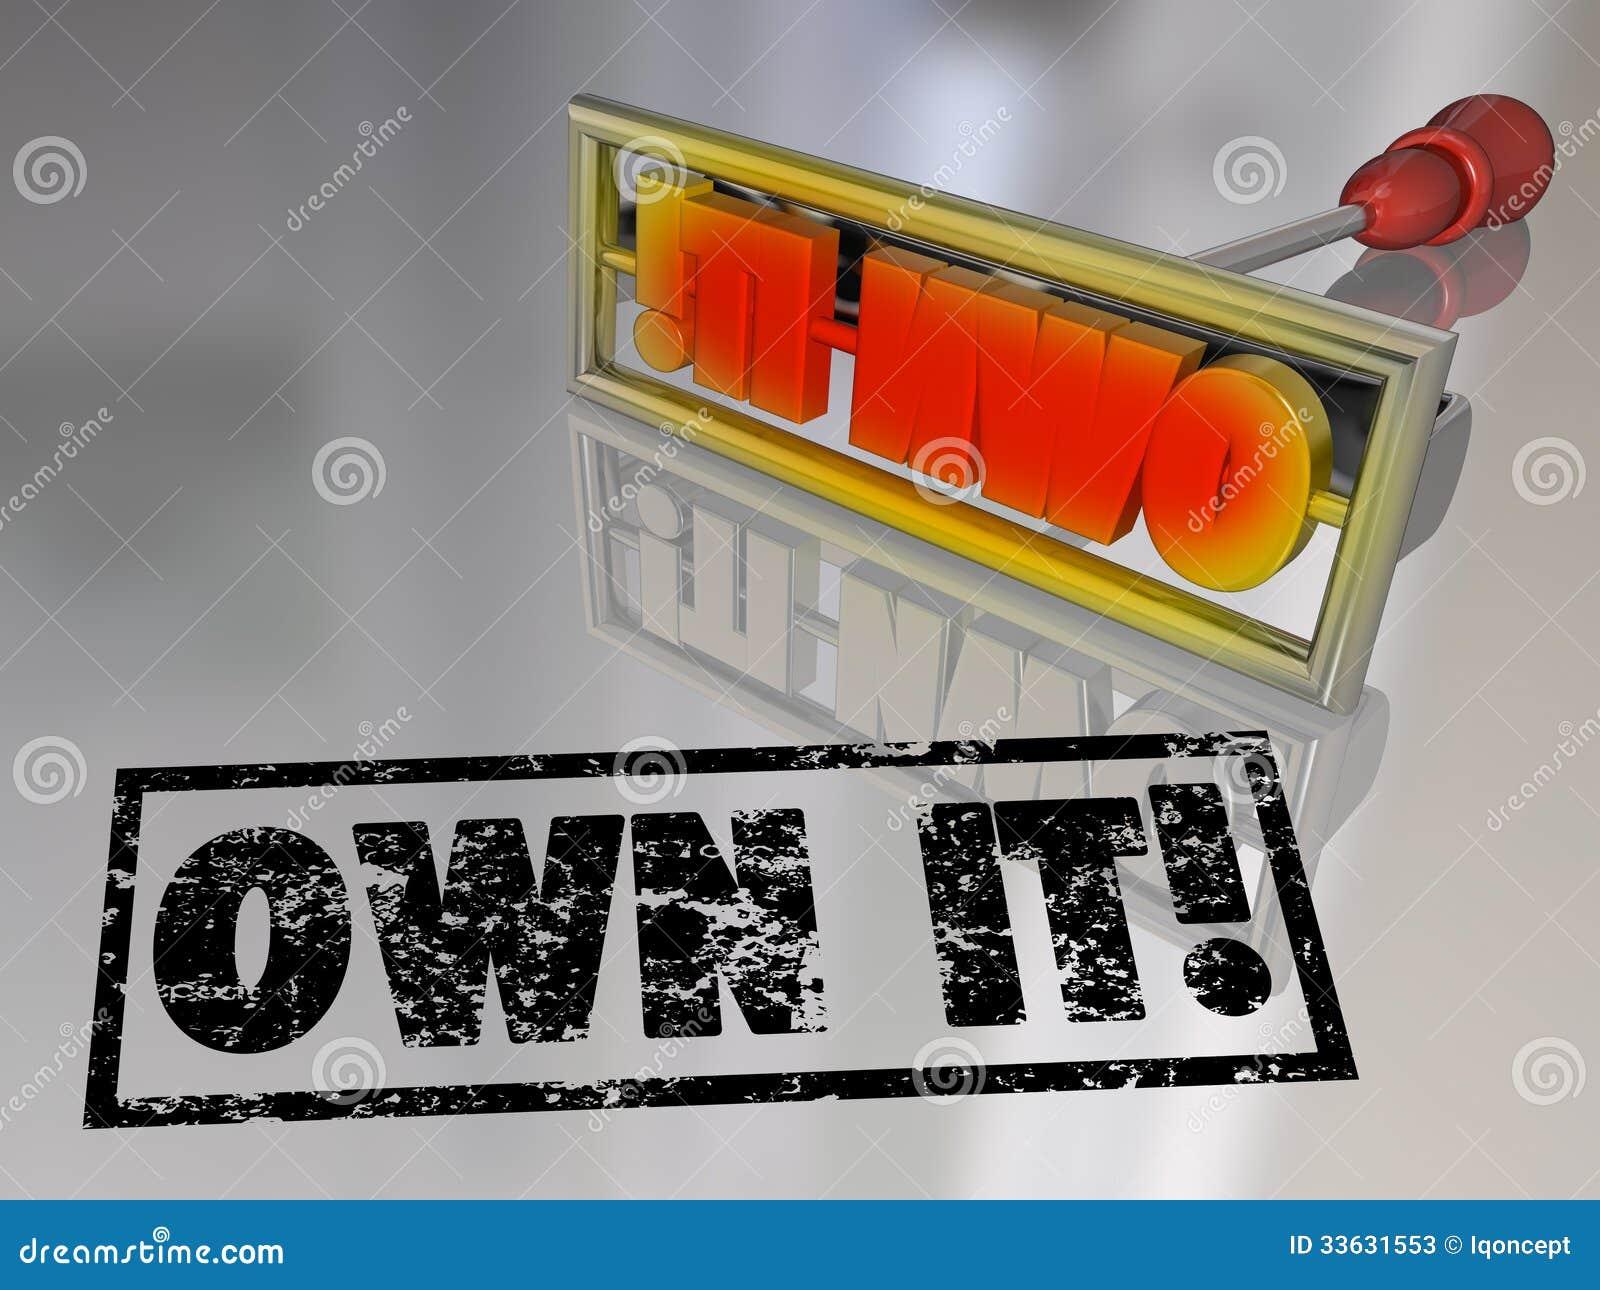 Own It Branding Iron Ownership Claim Responsibility